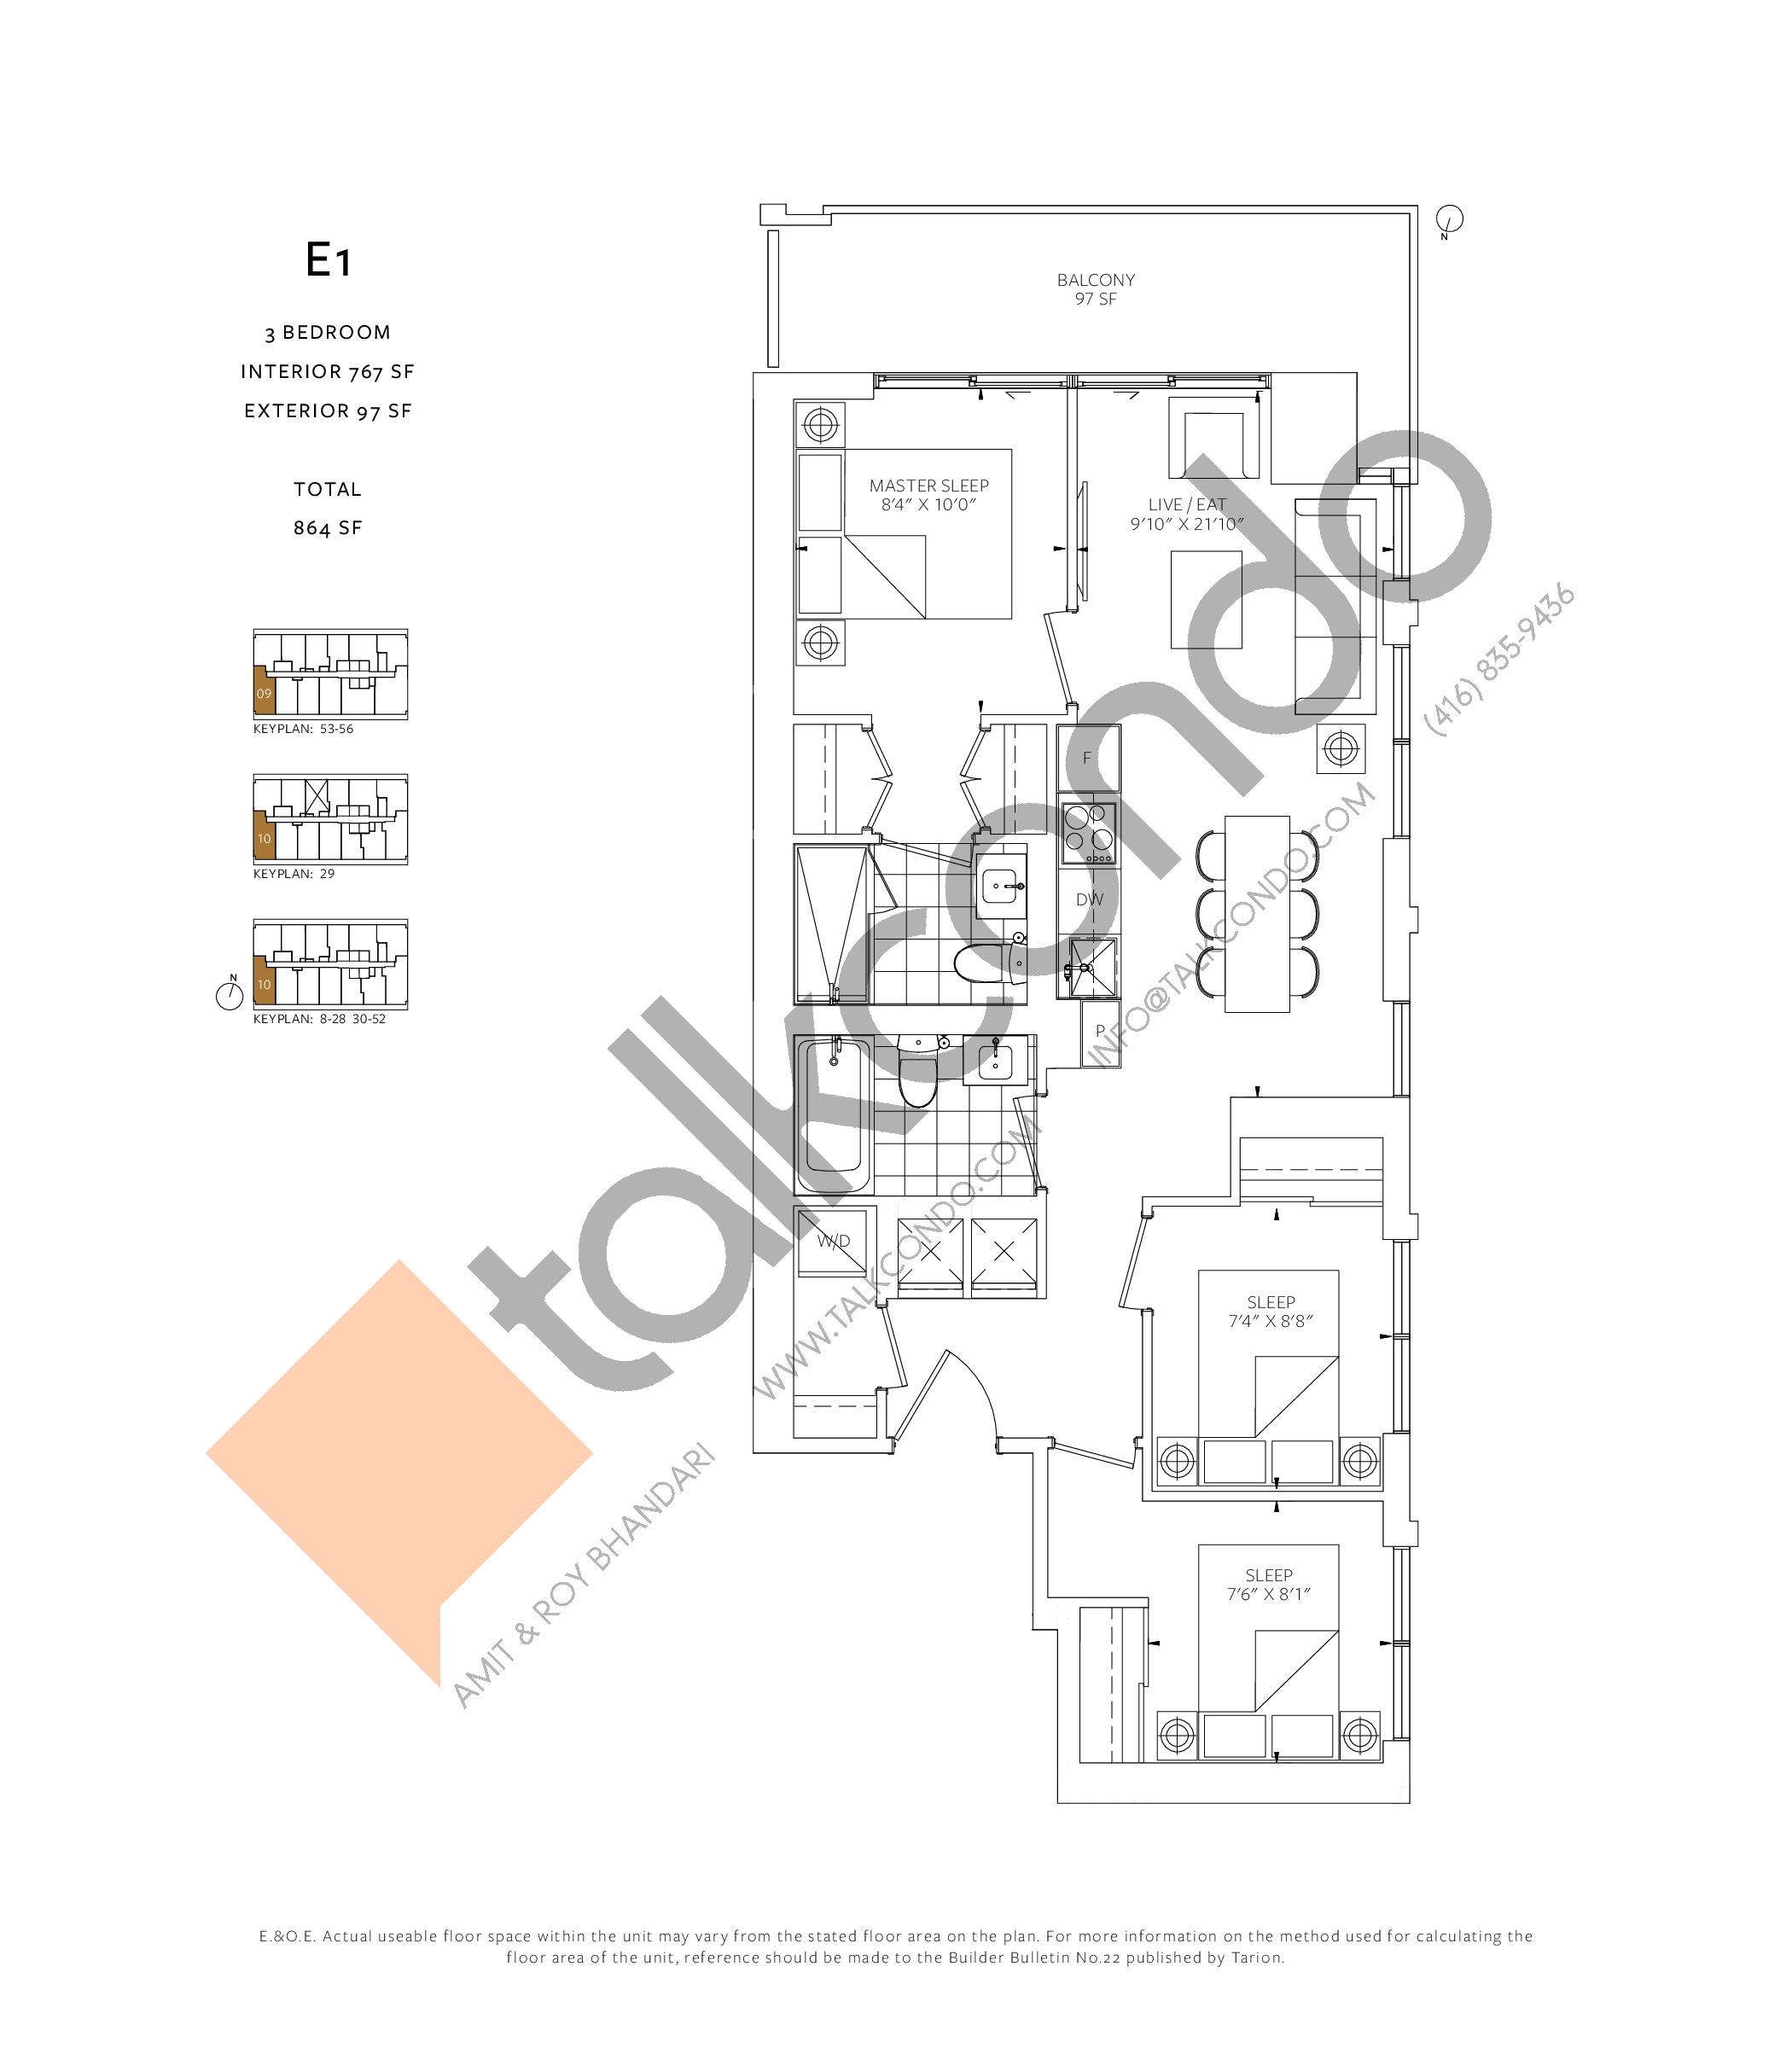 E1 Floor Plan at 88 Queen Condos - Phase 2 - 767 sq.ft